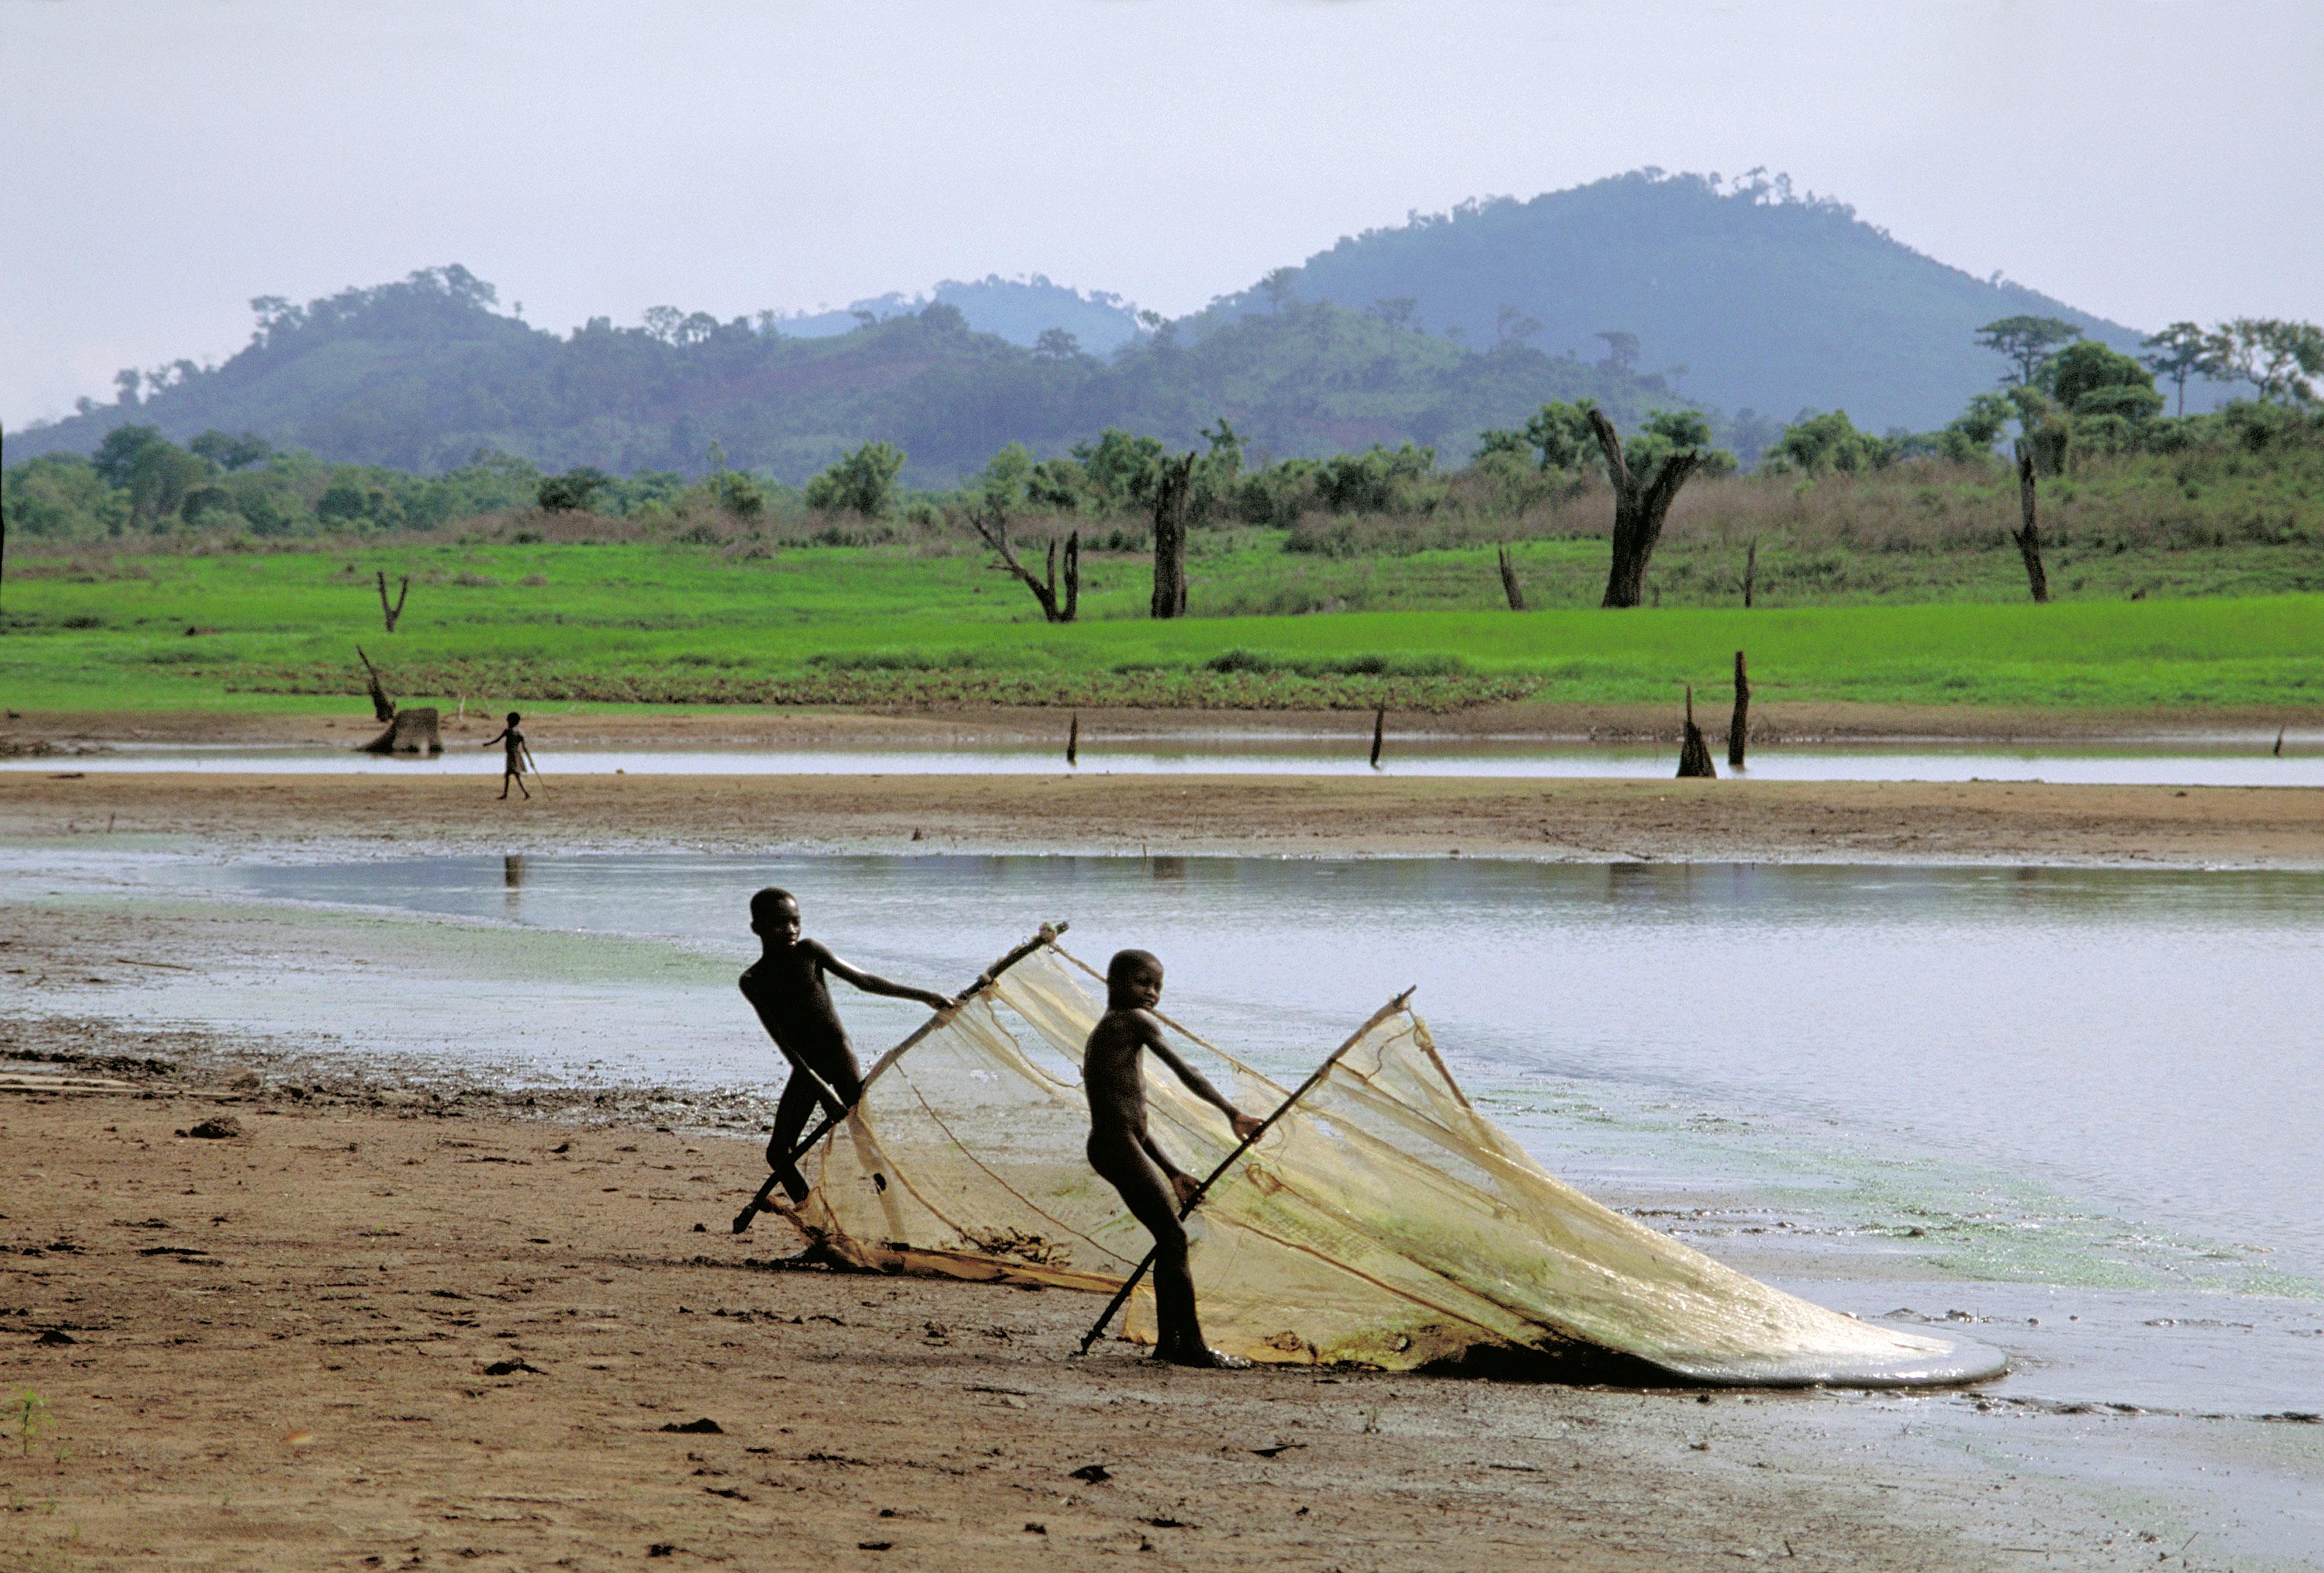 Boys fishing on Lake Volta in Ghana, West Africa.